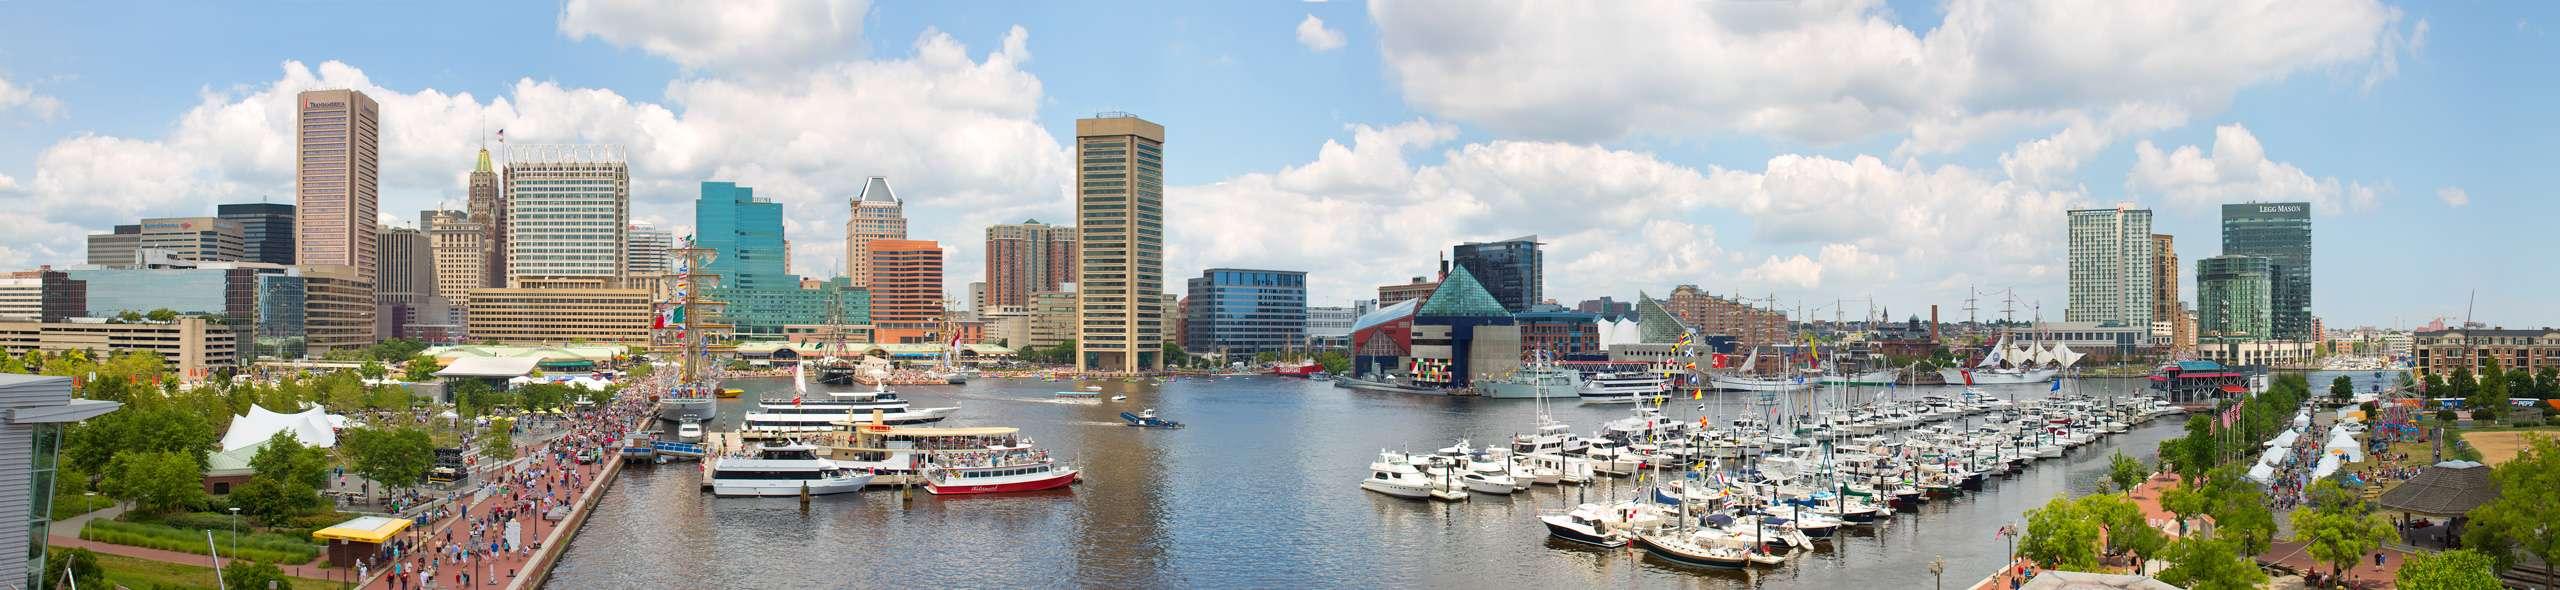 PORTFOLIO - Baltimore - Attractions  #12  PCG678